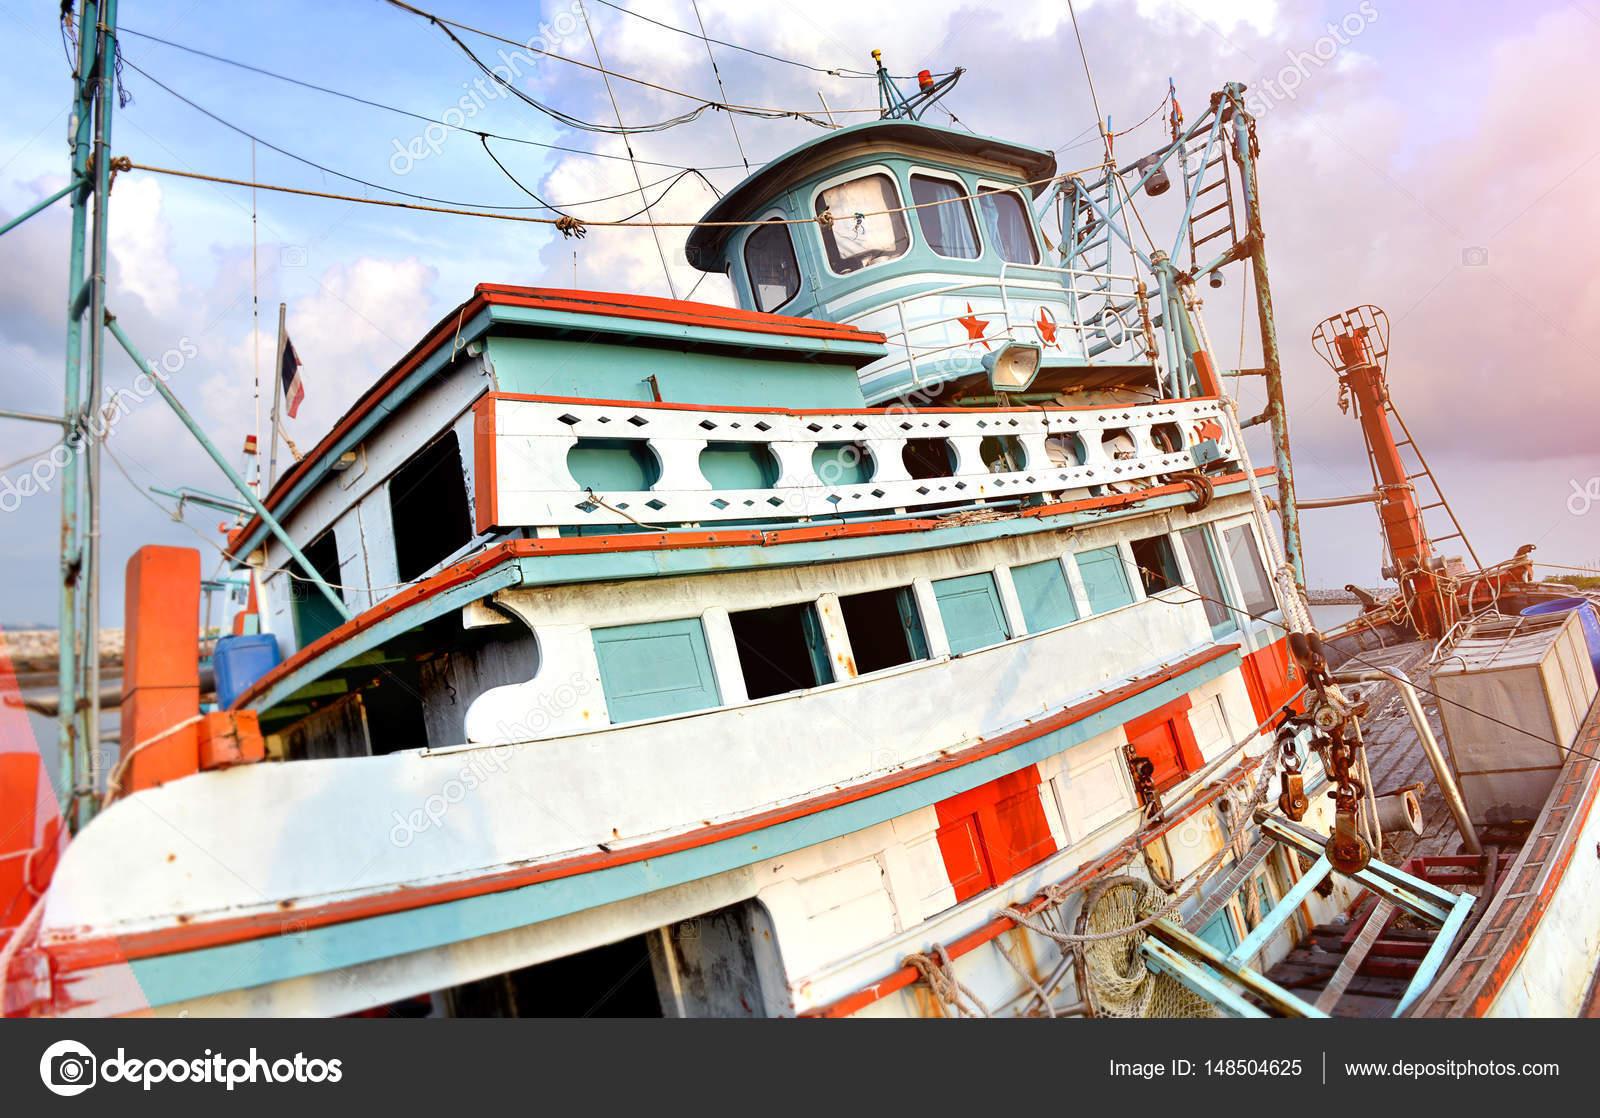 Grande legno pesca barca u2014 foto stock © lewzsan.gmail.com #148504625